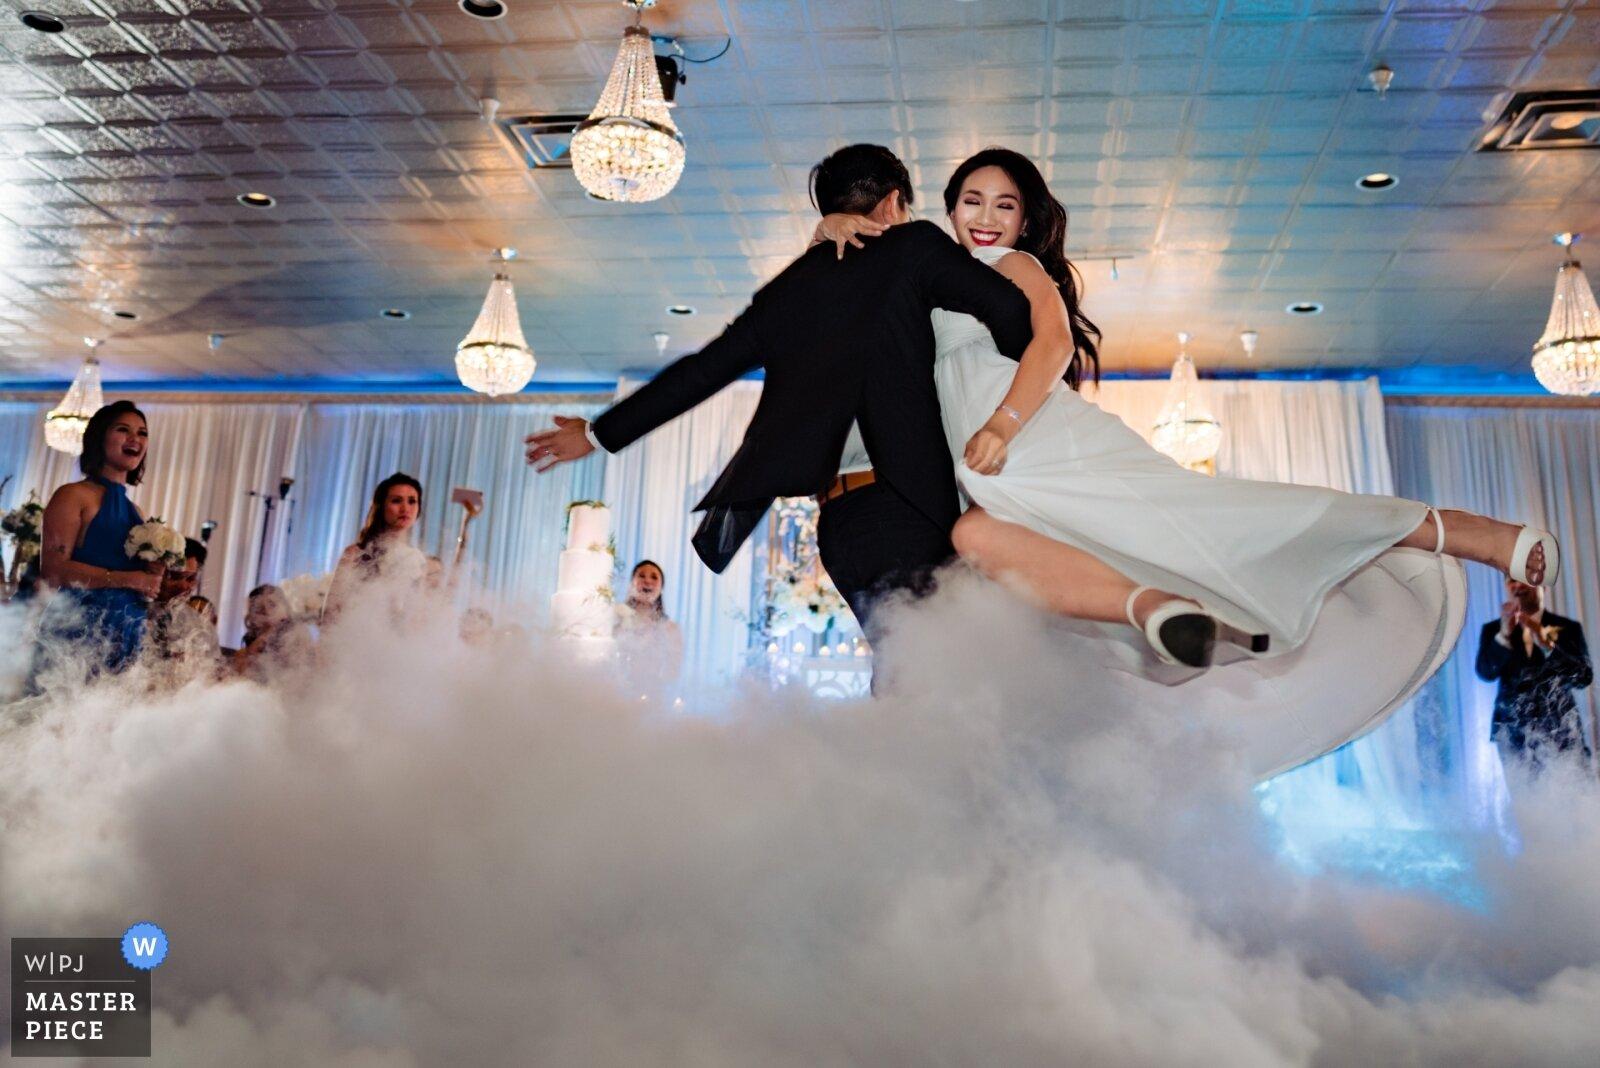 Masterpiece Award from  Wedding Photojournalist Association